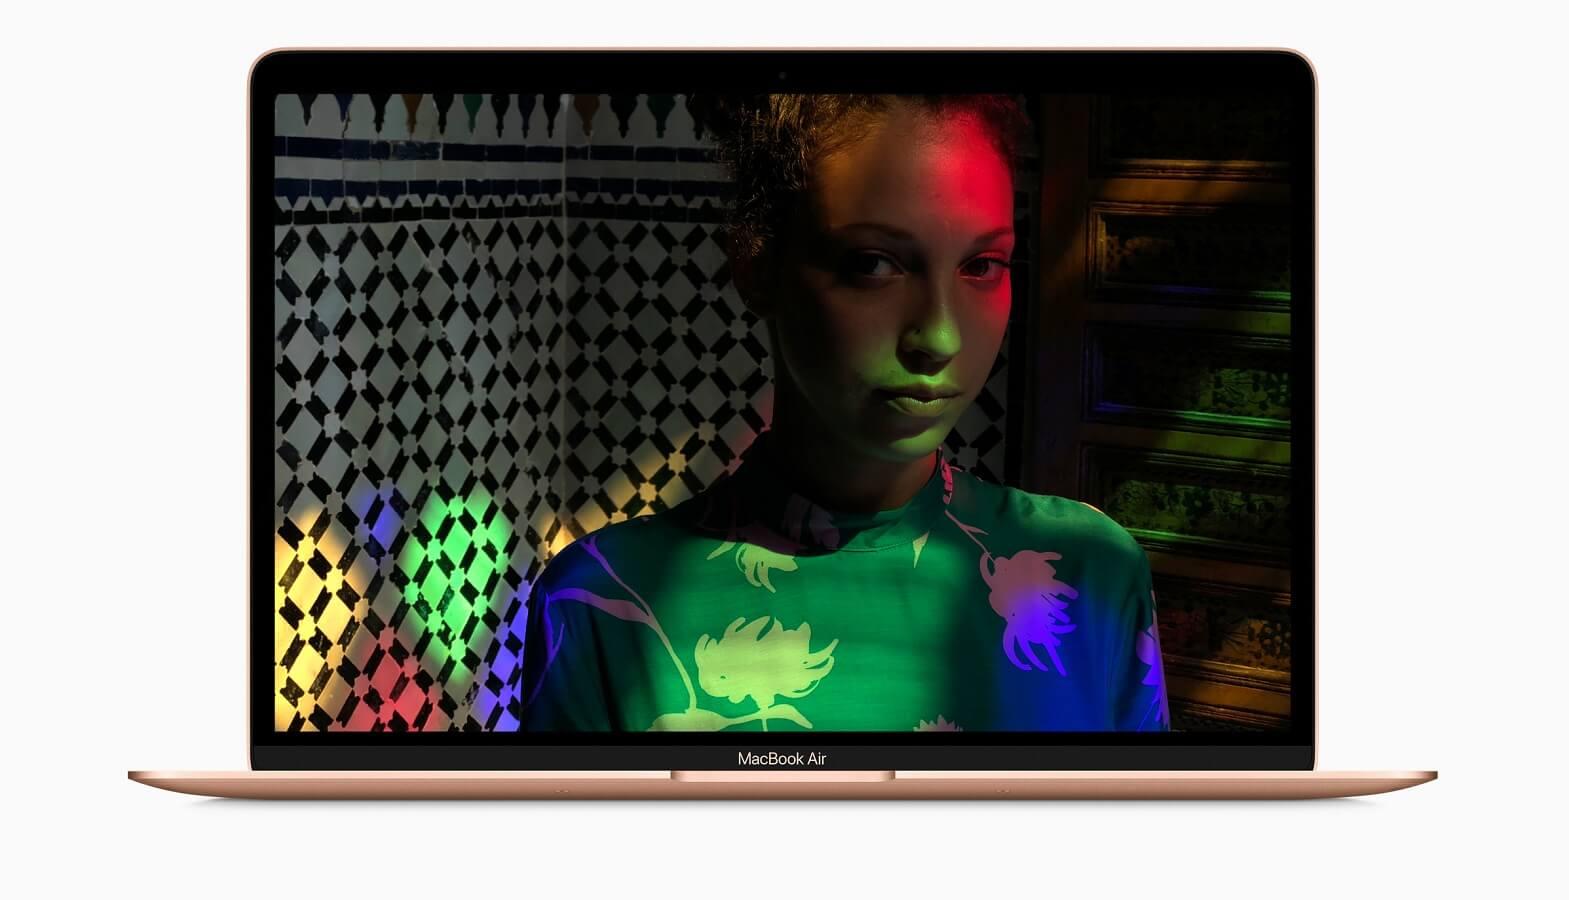 apple macbook air new 2018